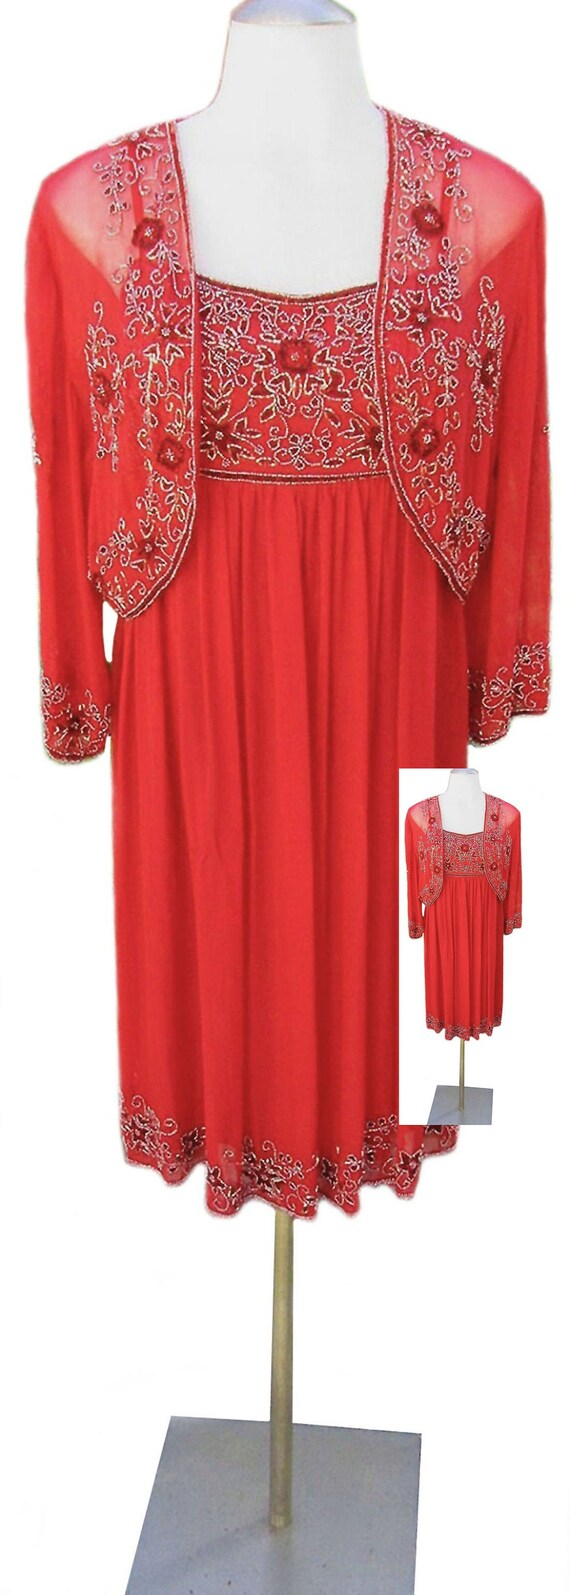 Red Silk Dress / Beaded / Sheer Cropped Jacket / V